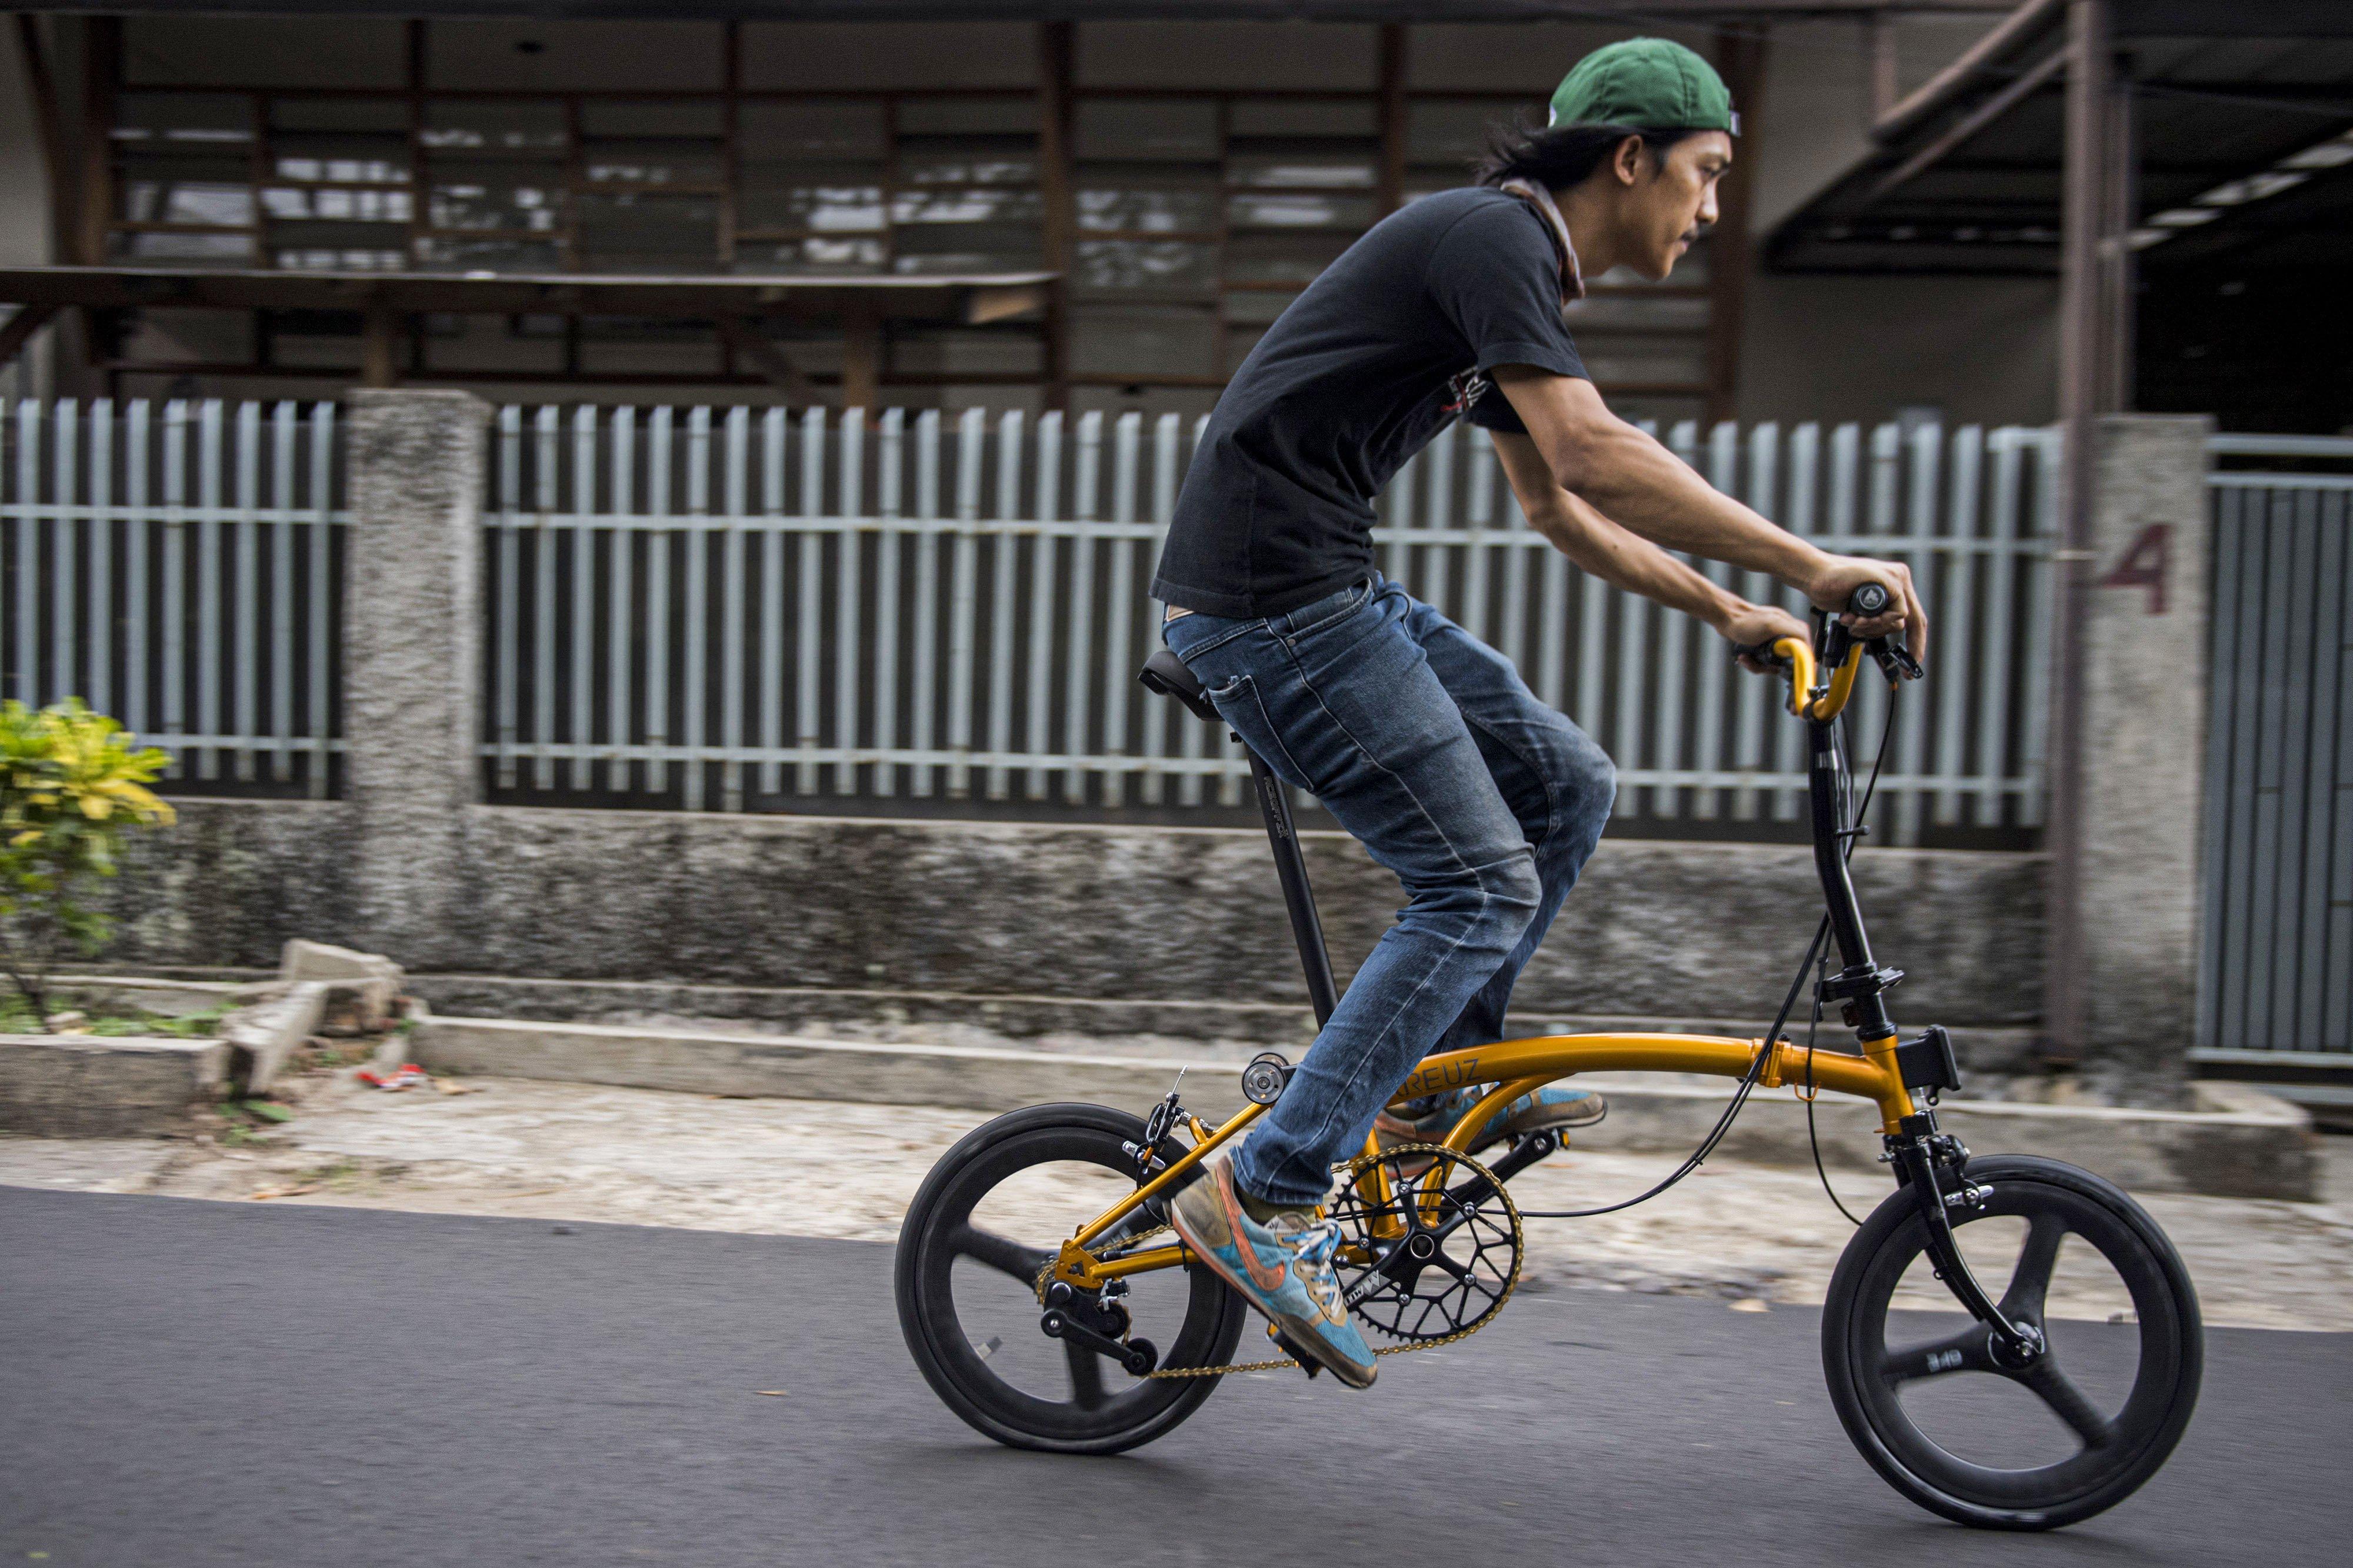 Pekerja melakukan uji coba ketahanan dan akurasi sepeda lipat Kreuz di Bandung, Jawa Barat, Jumat (20/11/2020).